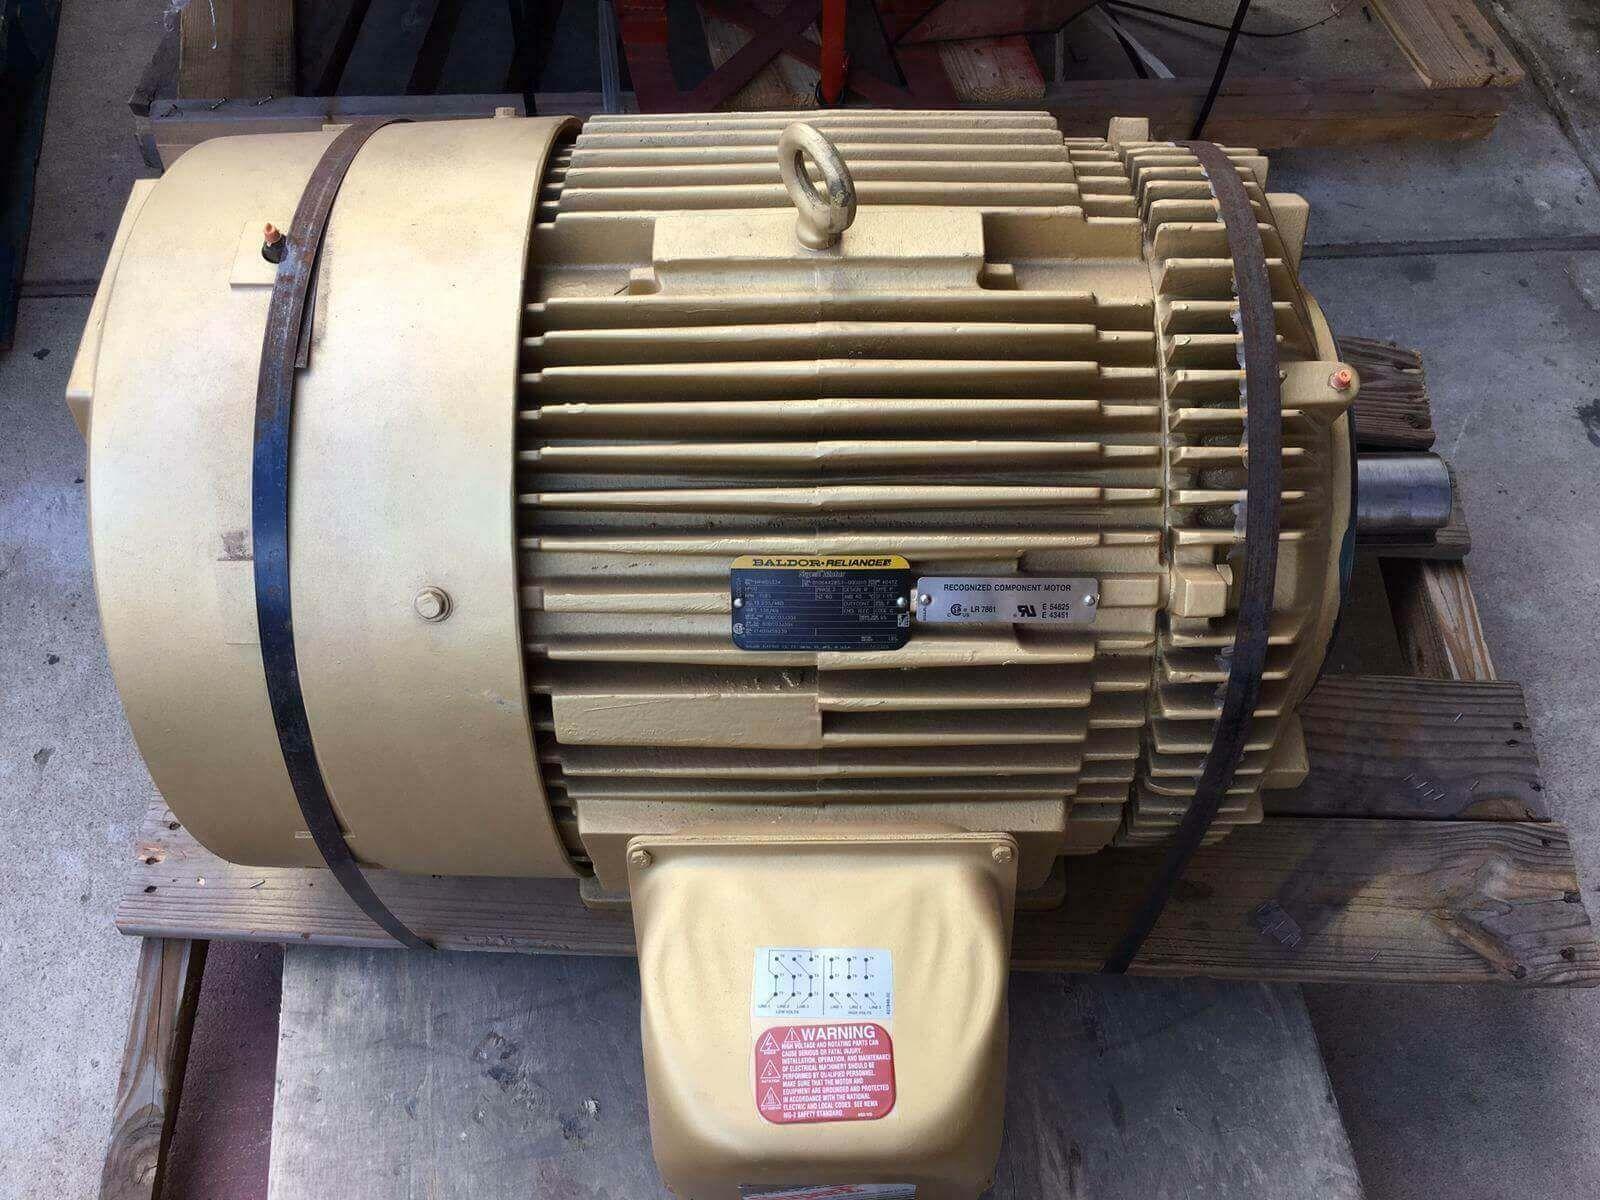 MP40G334 60 HP, 1185 RPM NEW BALDOR ELECTRIC MOTOR